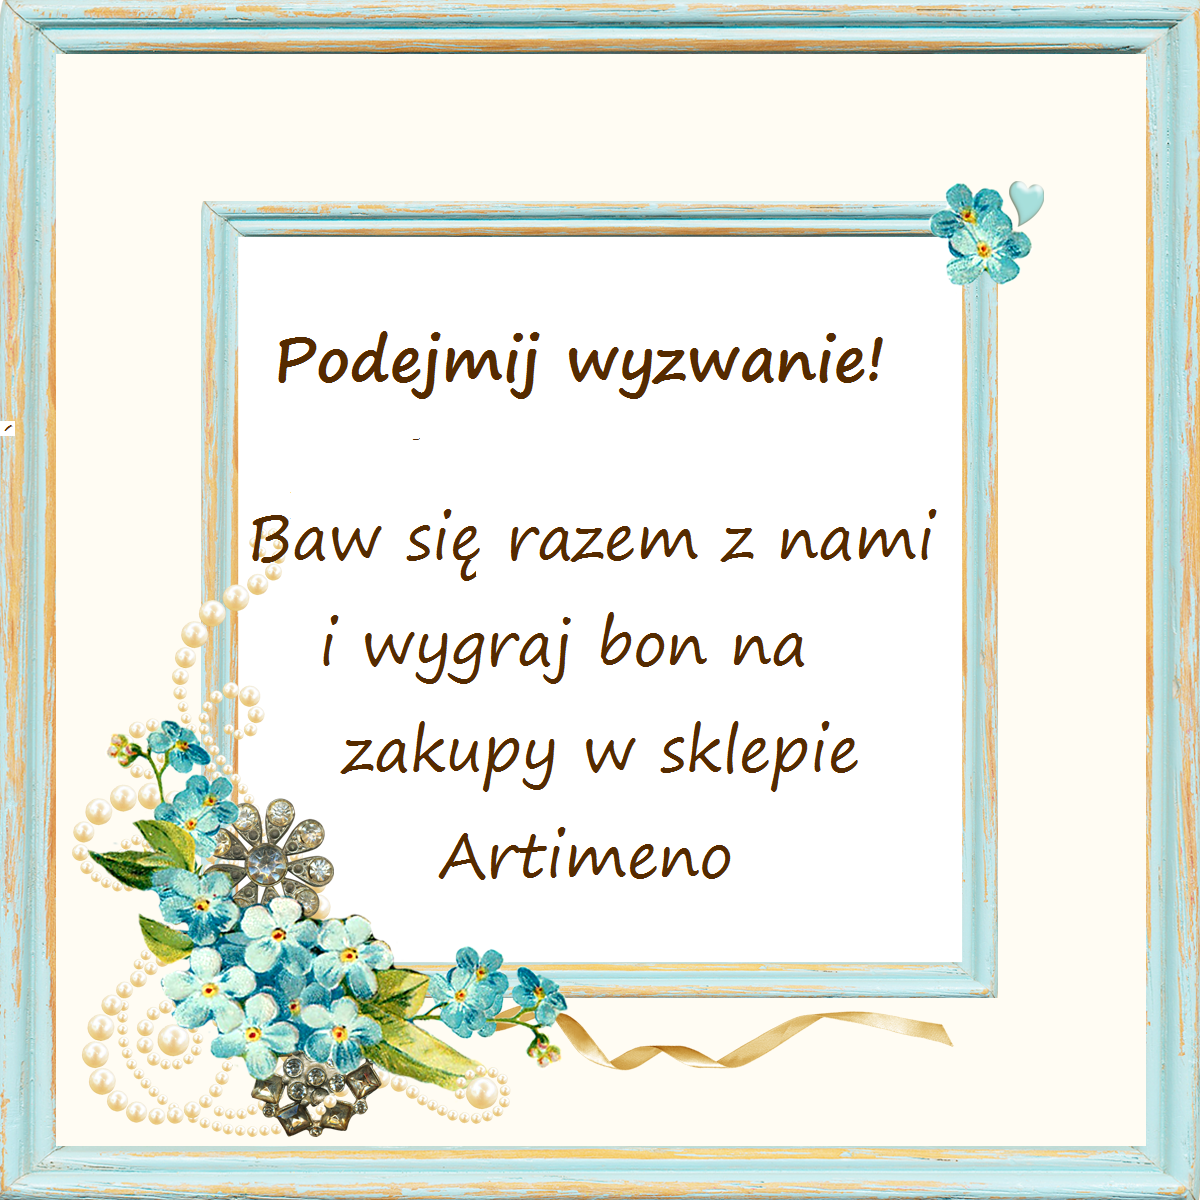 http://artimeno.blogspot.com/2014/09/wyzwanie-28.html